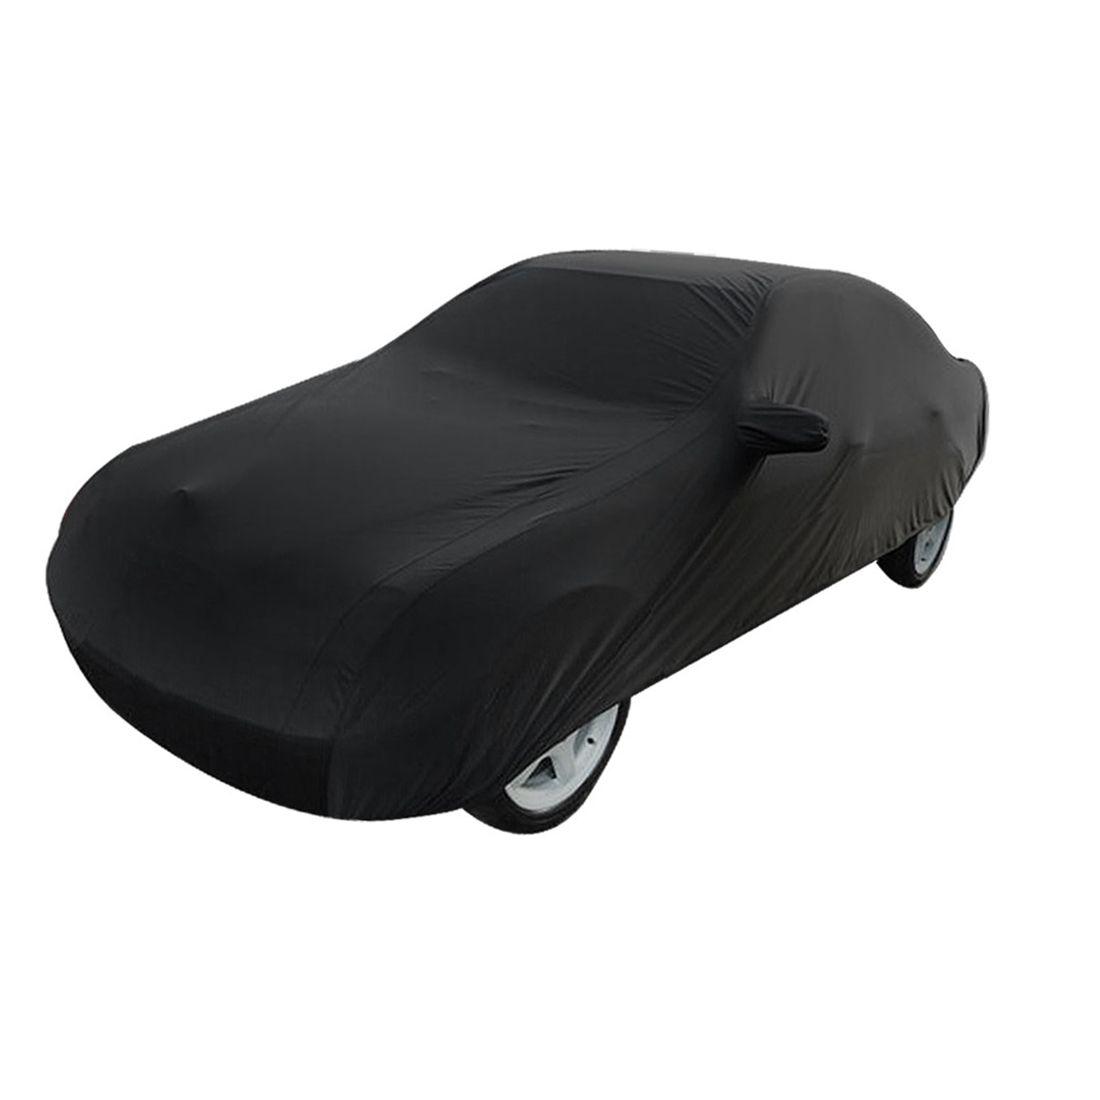 Durable outdoor stormproof waterproof breathableblack car